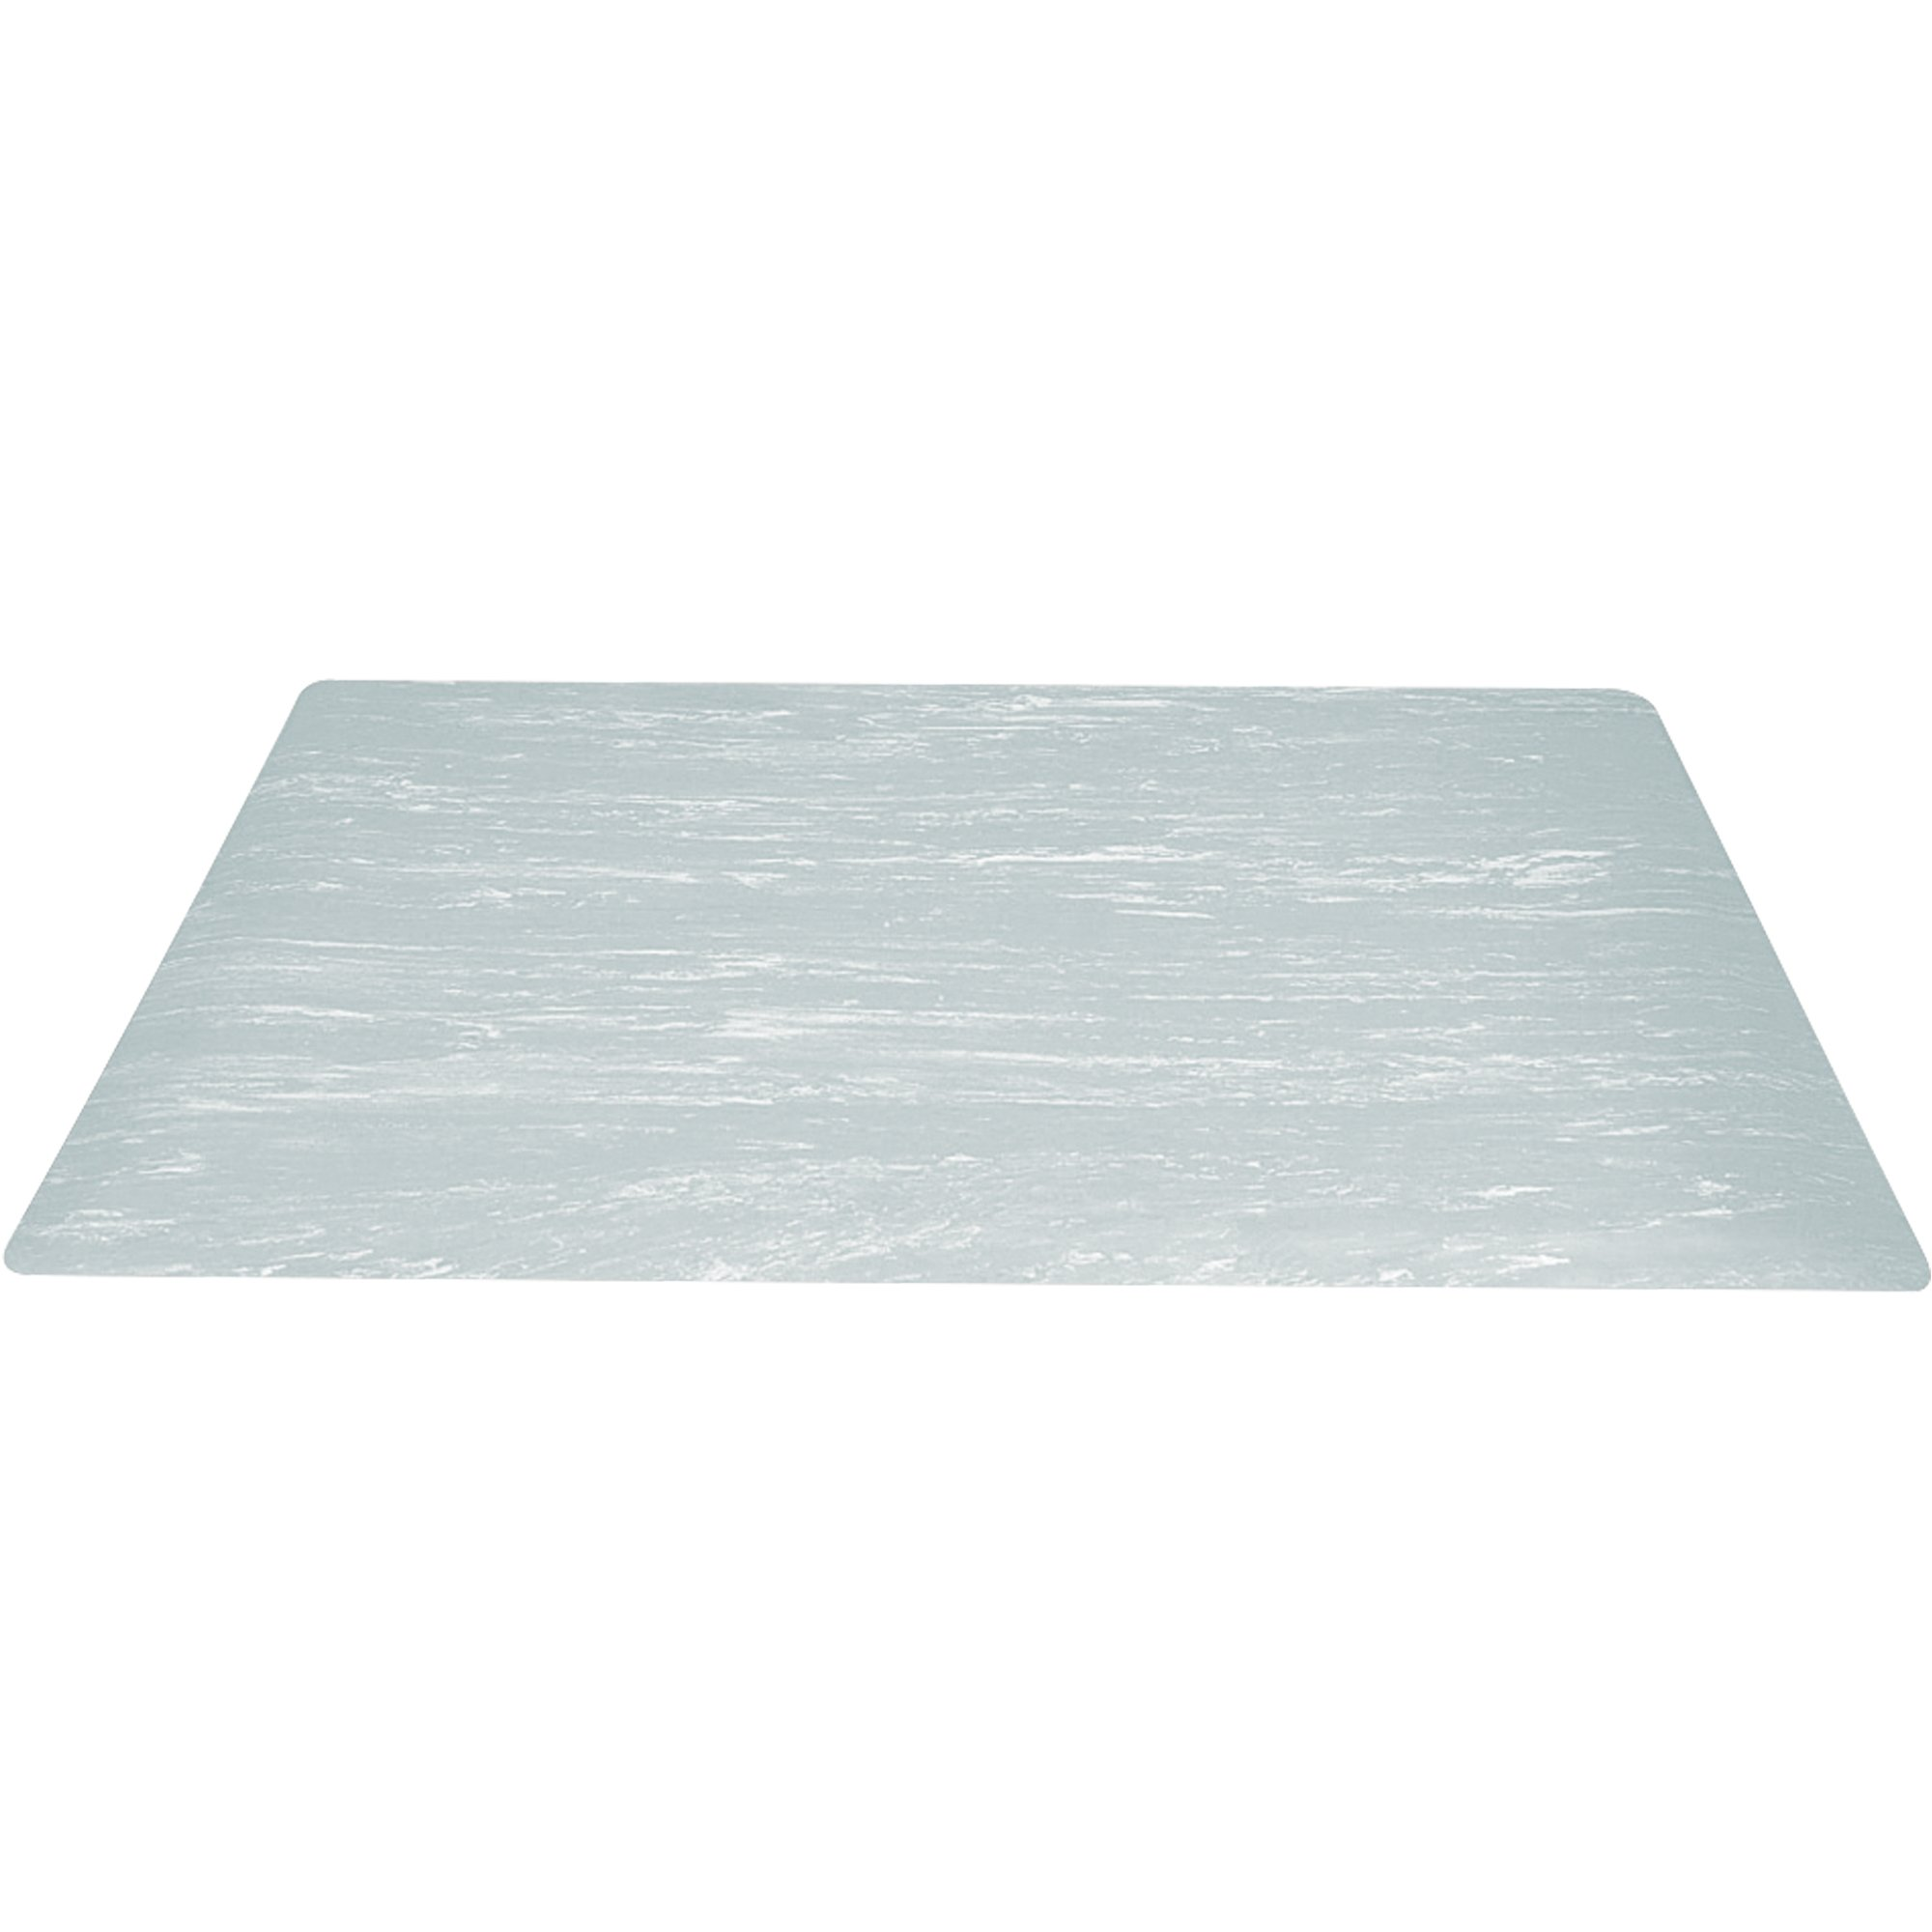 3 x 5' Gray Marble Anti-Fatigue Mat